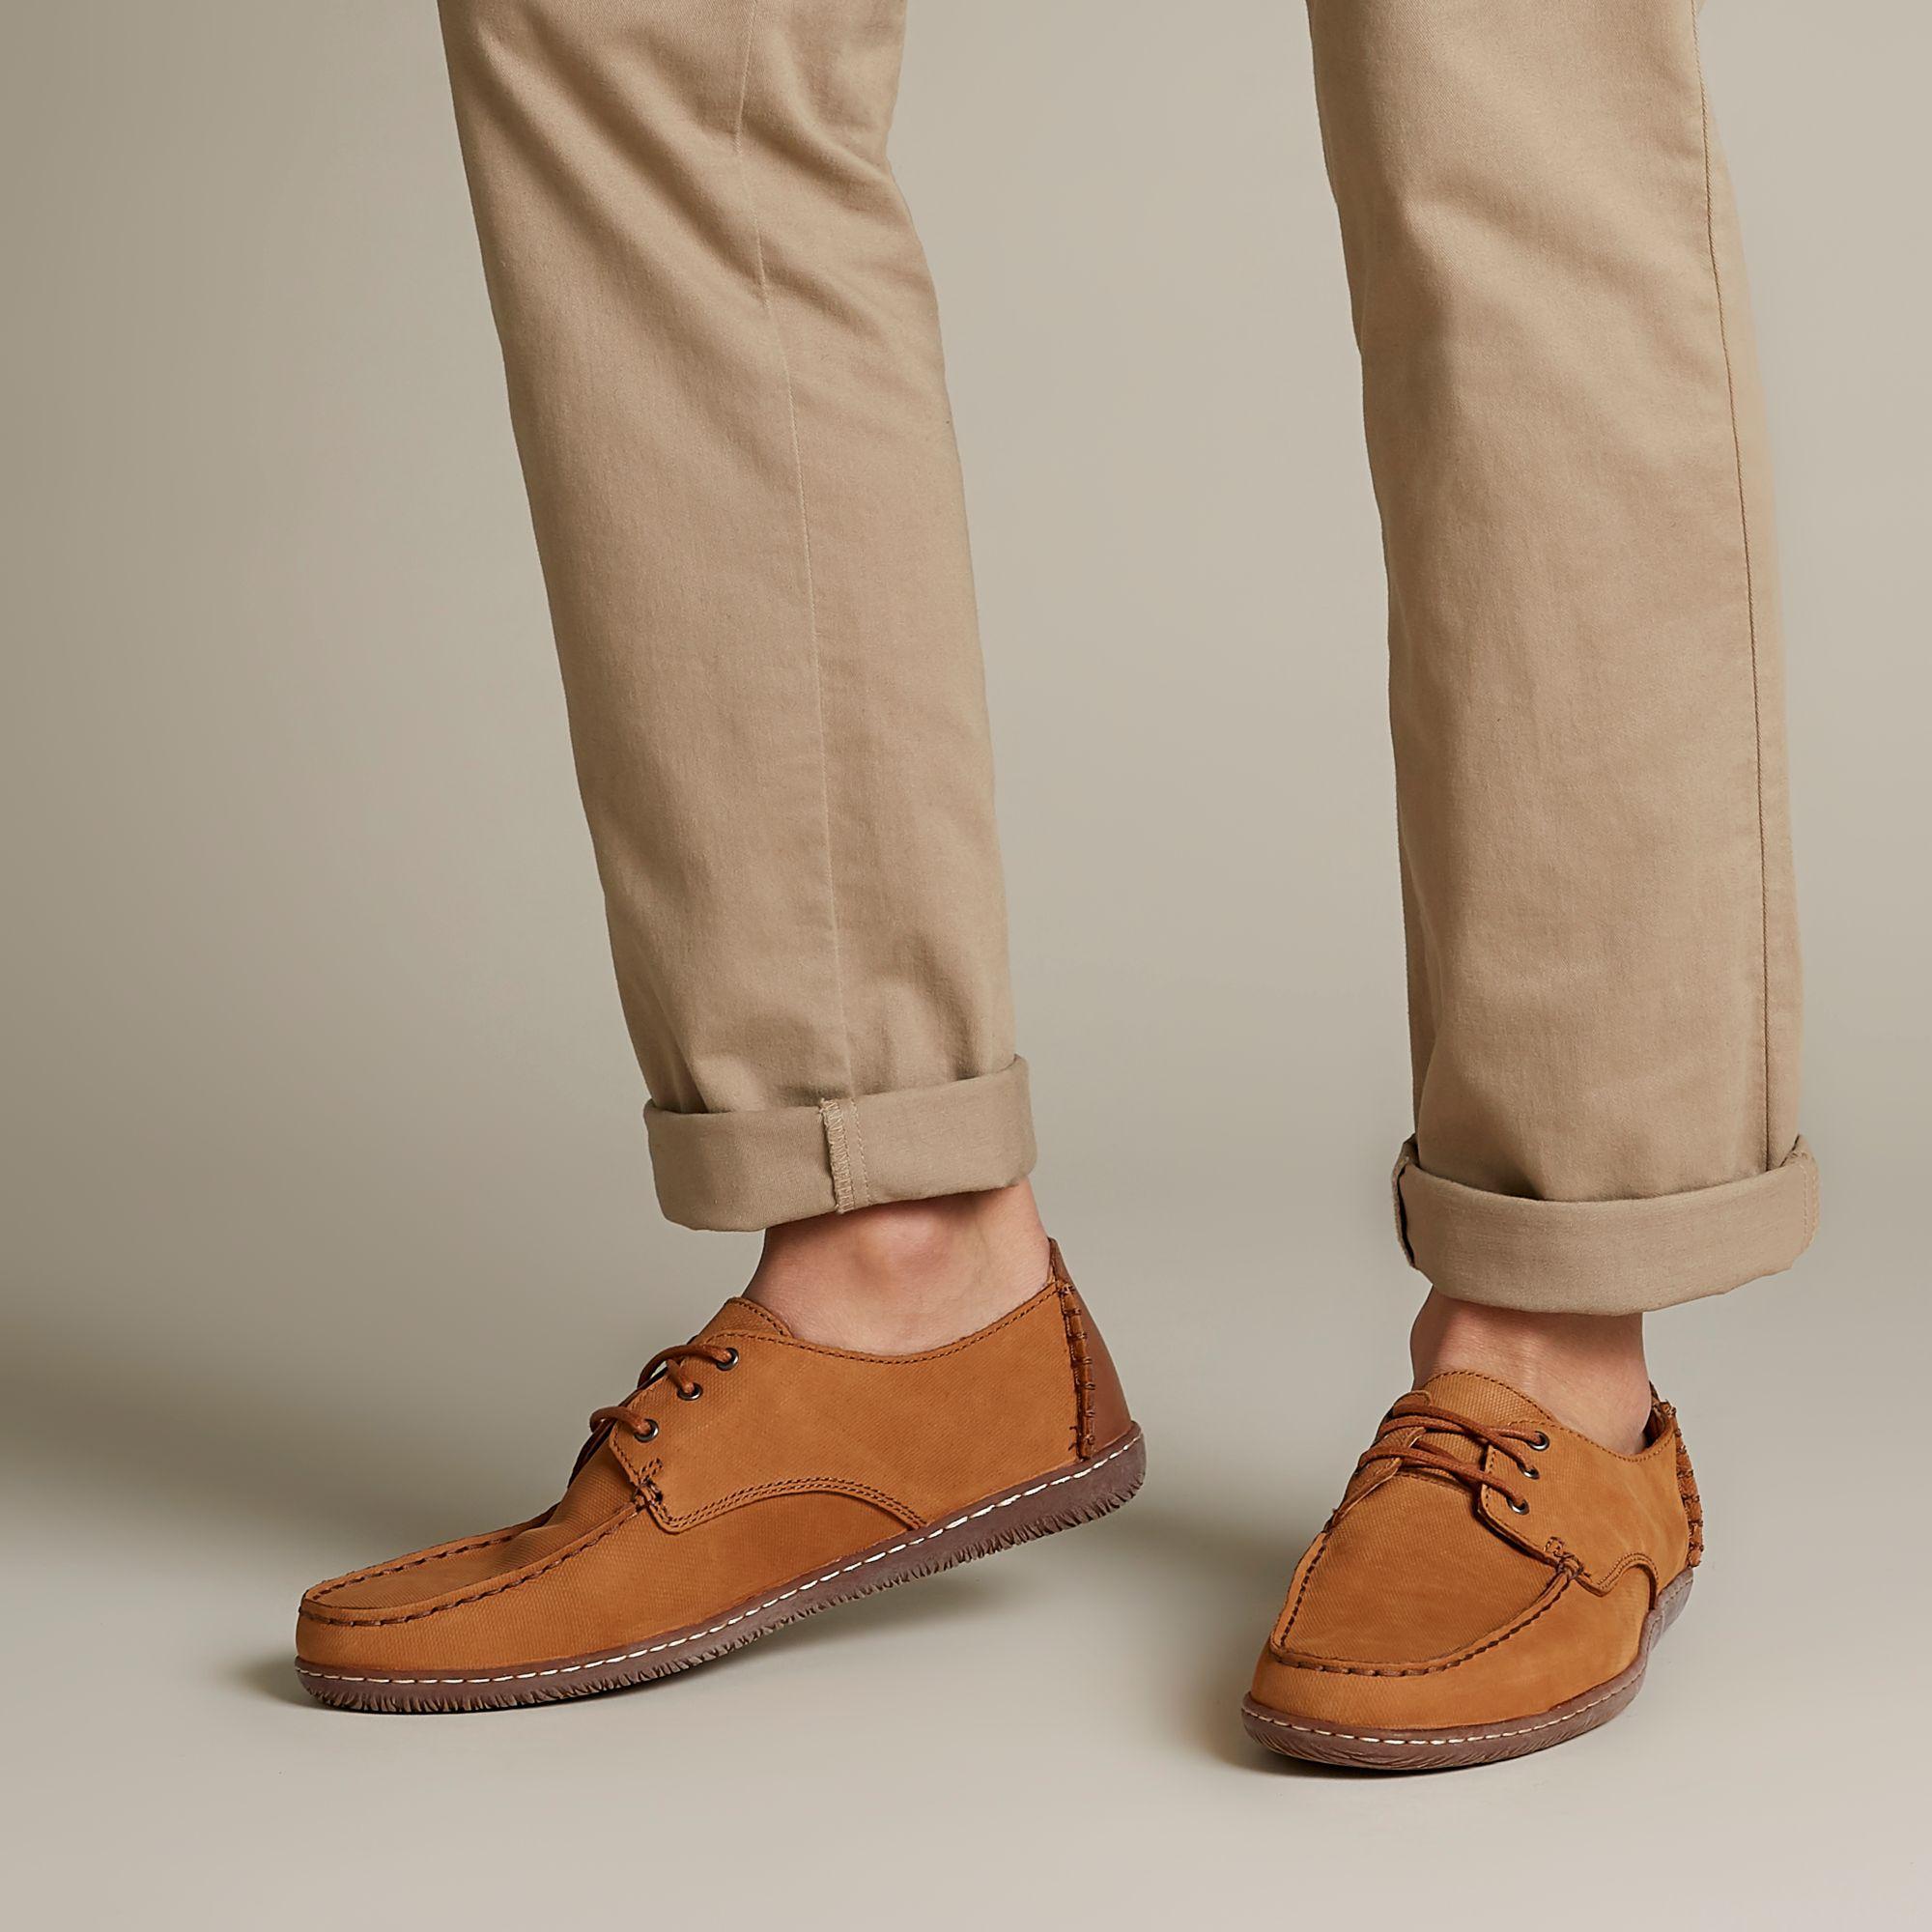 new images of hot-selling genuine online shop Clarks Saltash Lace in Tan Nubuck (Brown) for Men - Lyst